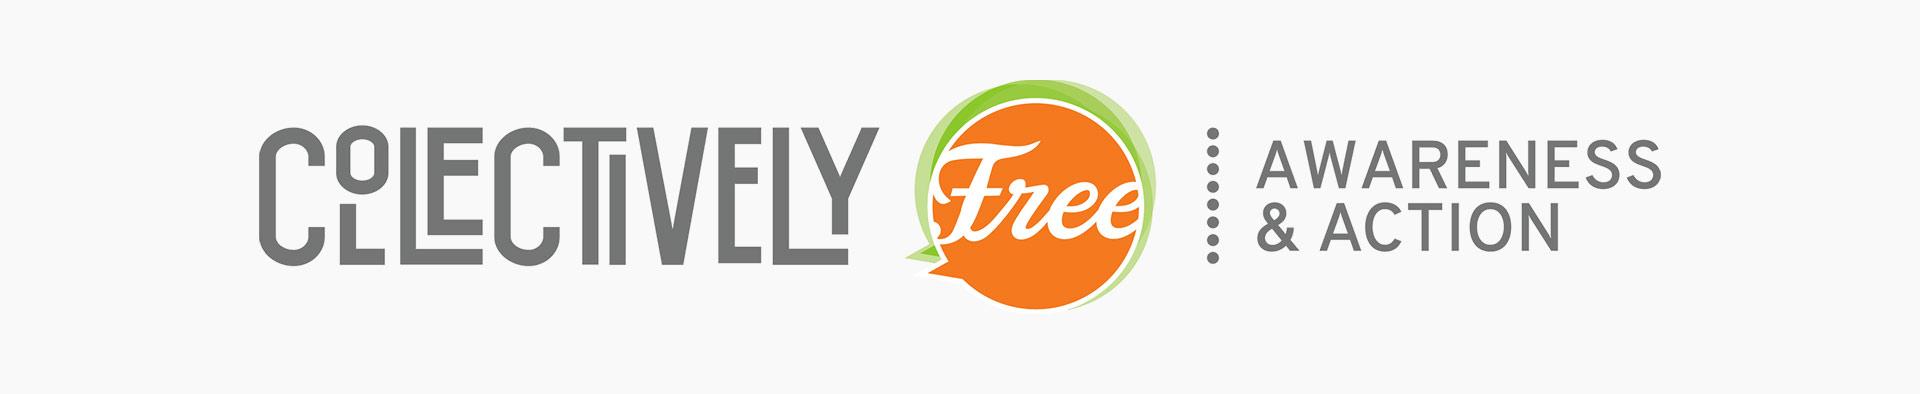 Collectively Free logo header